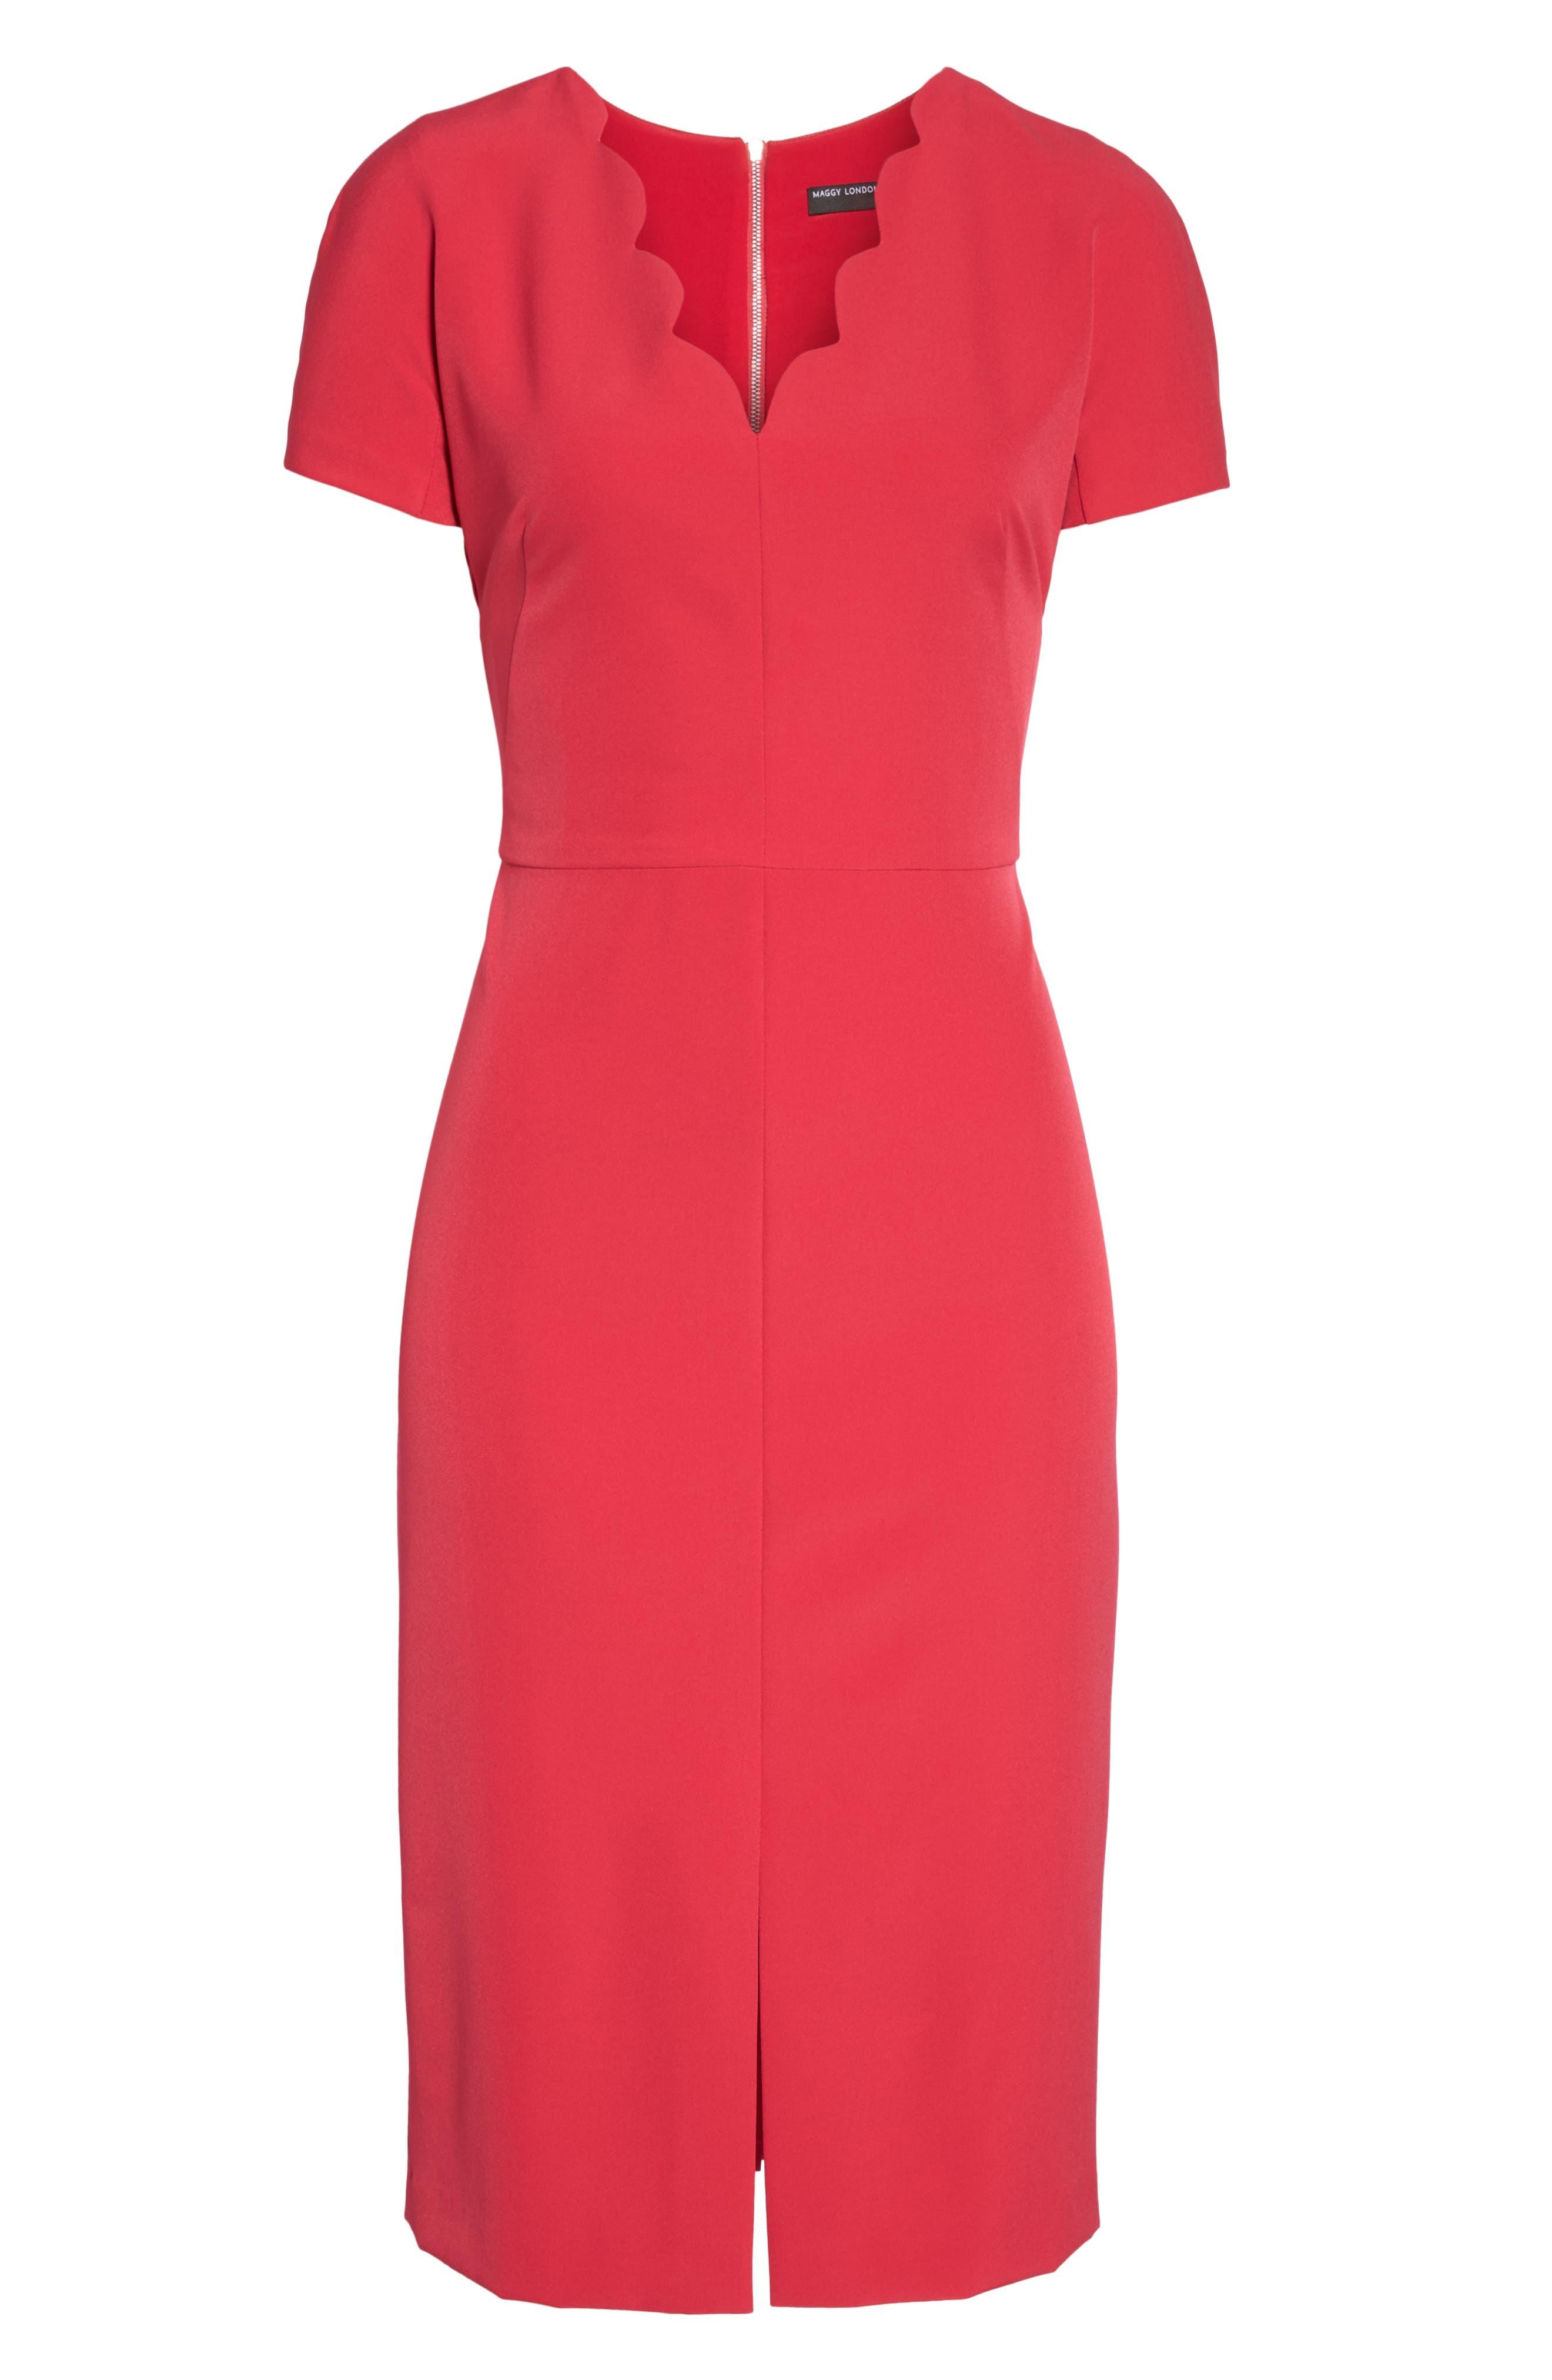 Scallop Sheath Dress,                             Alternate thumbnail 7, color,                             650